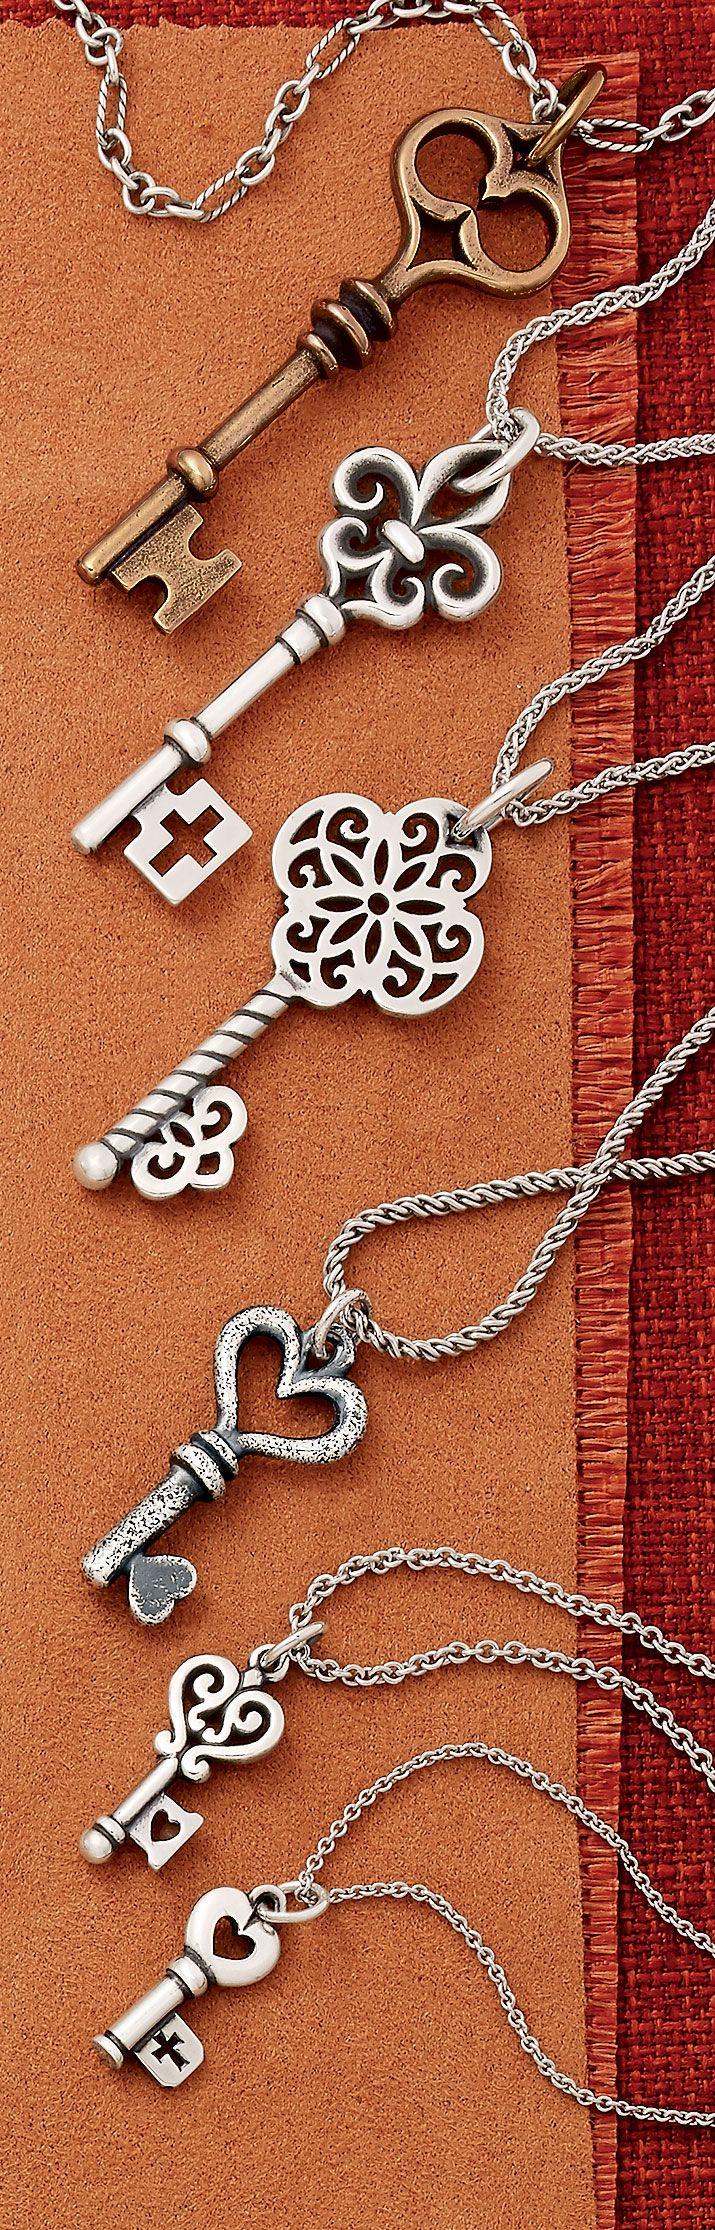 Pandora bracelet dillards - Fall Collection Key Pendants And Charms Jamesavery